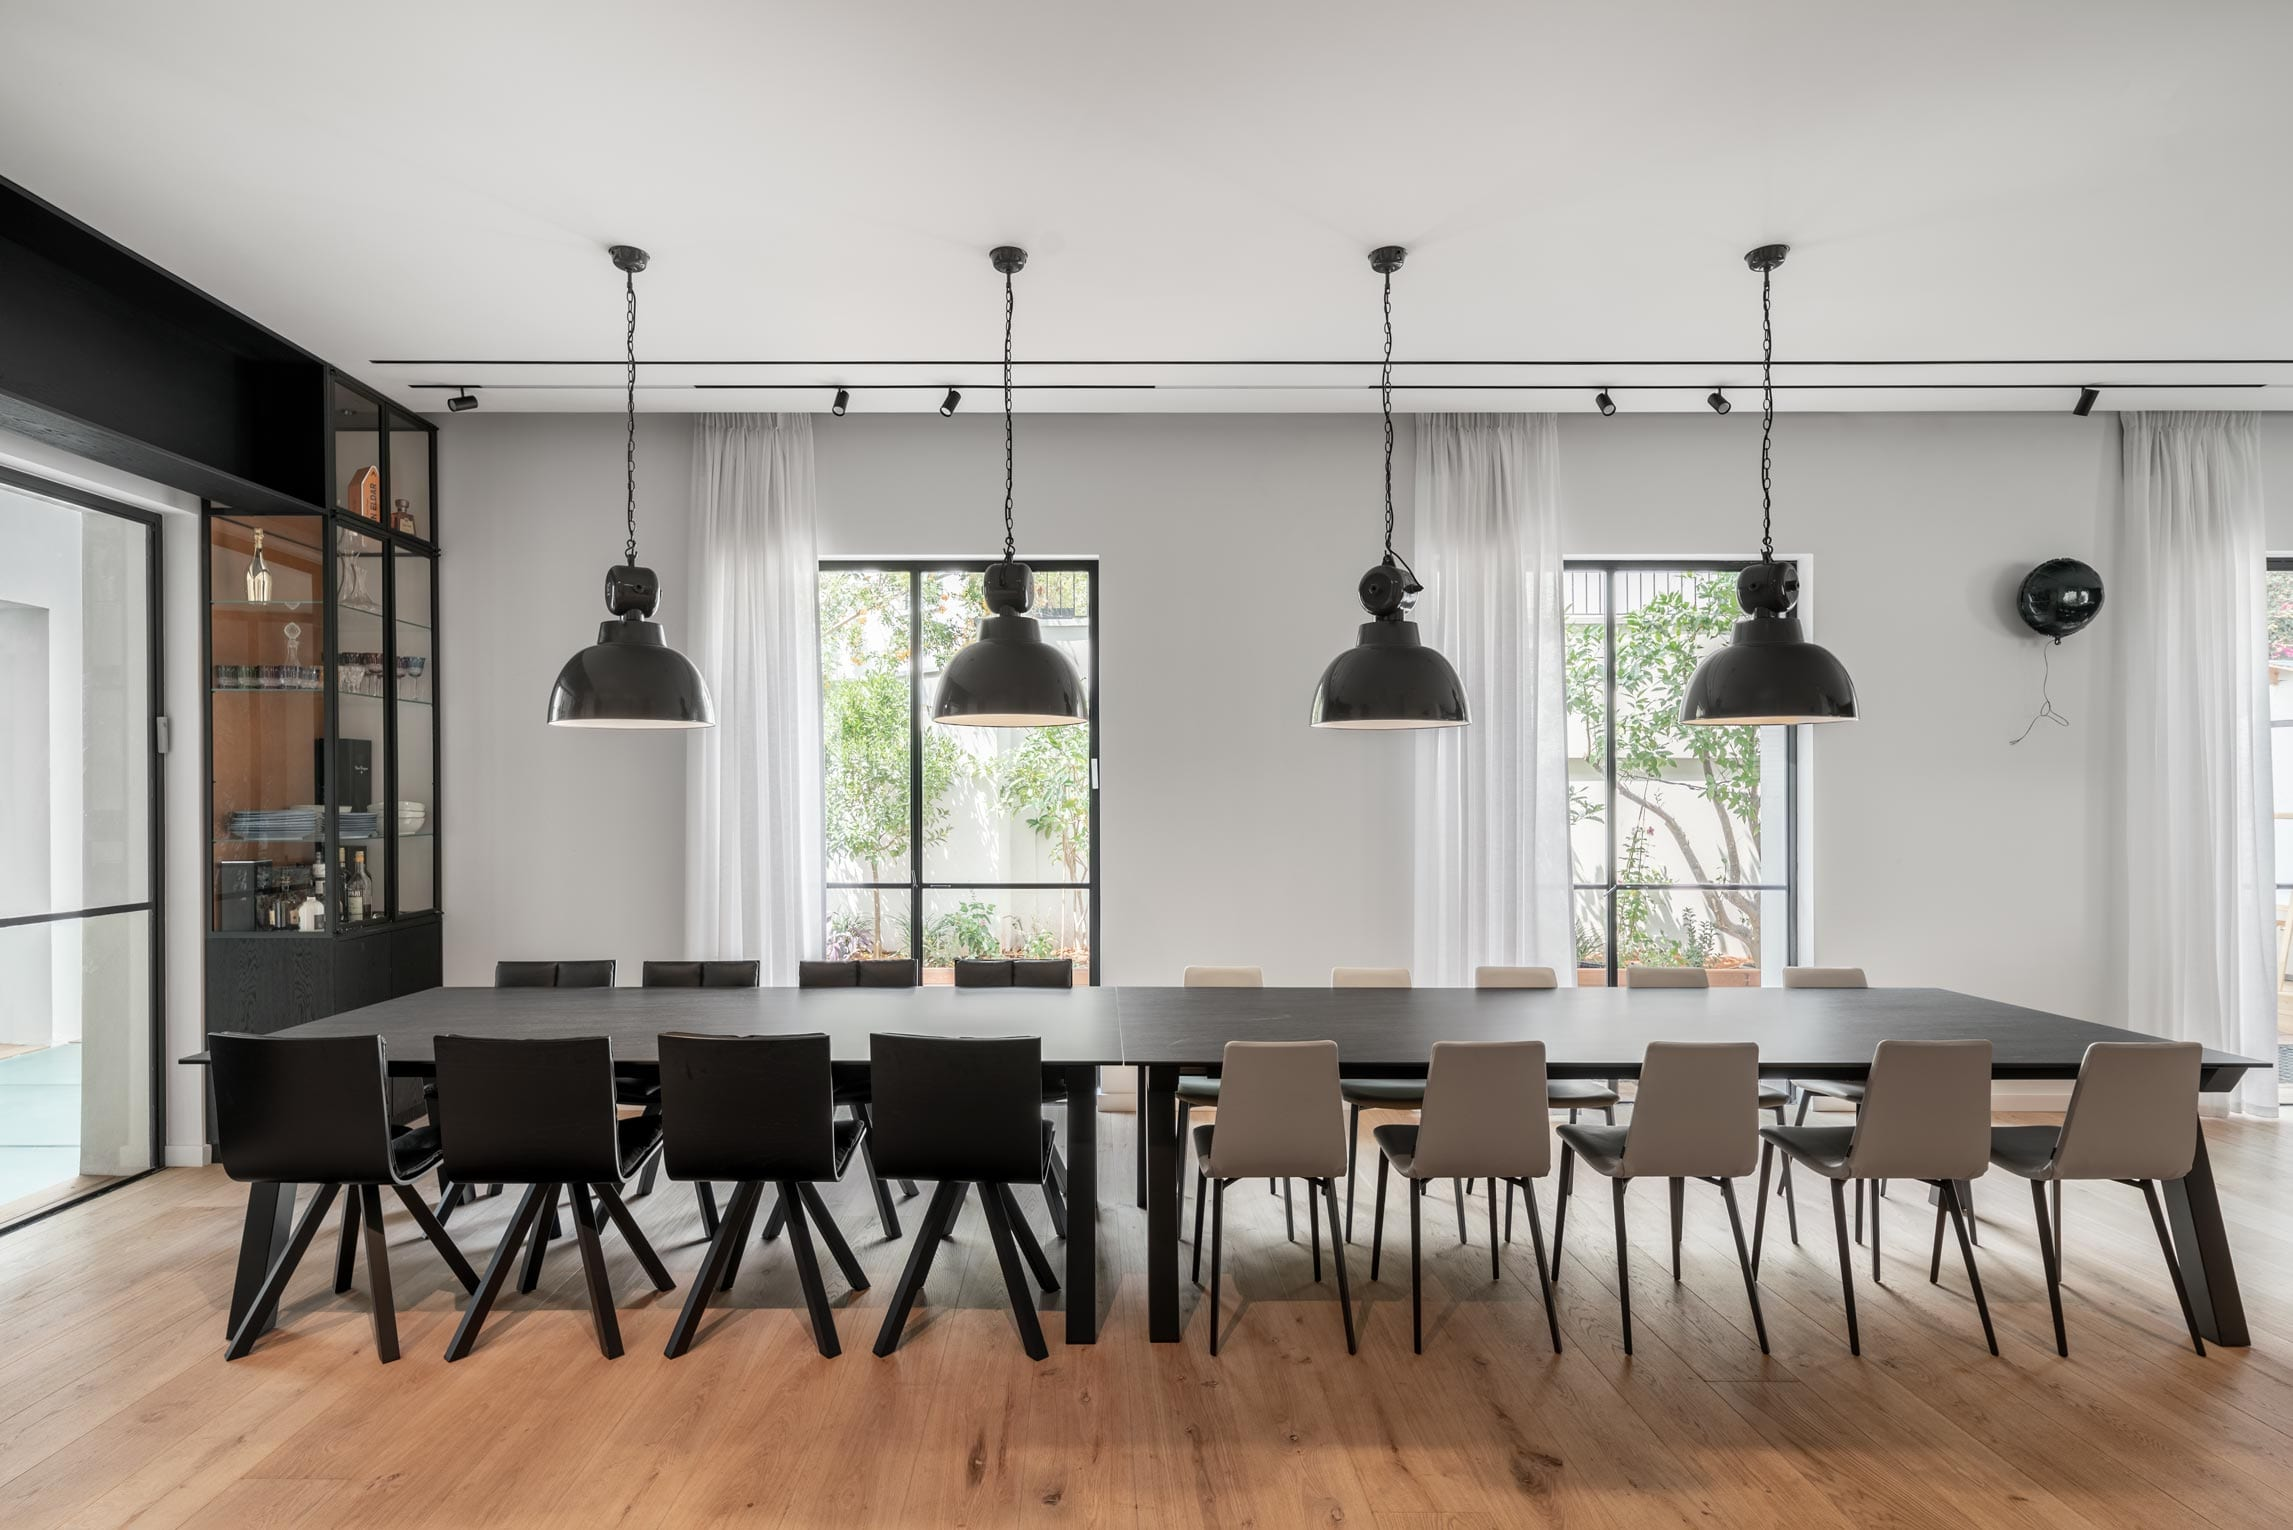 Belgian windows, Belgian profile Minimalist iron in black anti-rust with insulating glass for thermal window